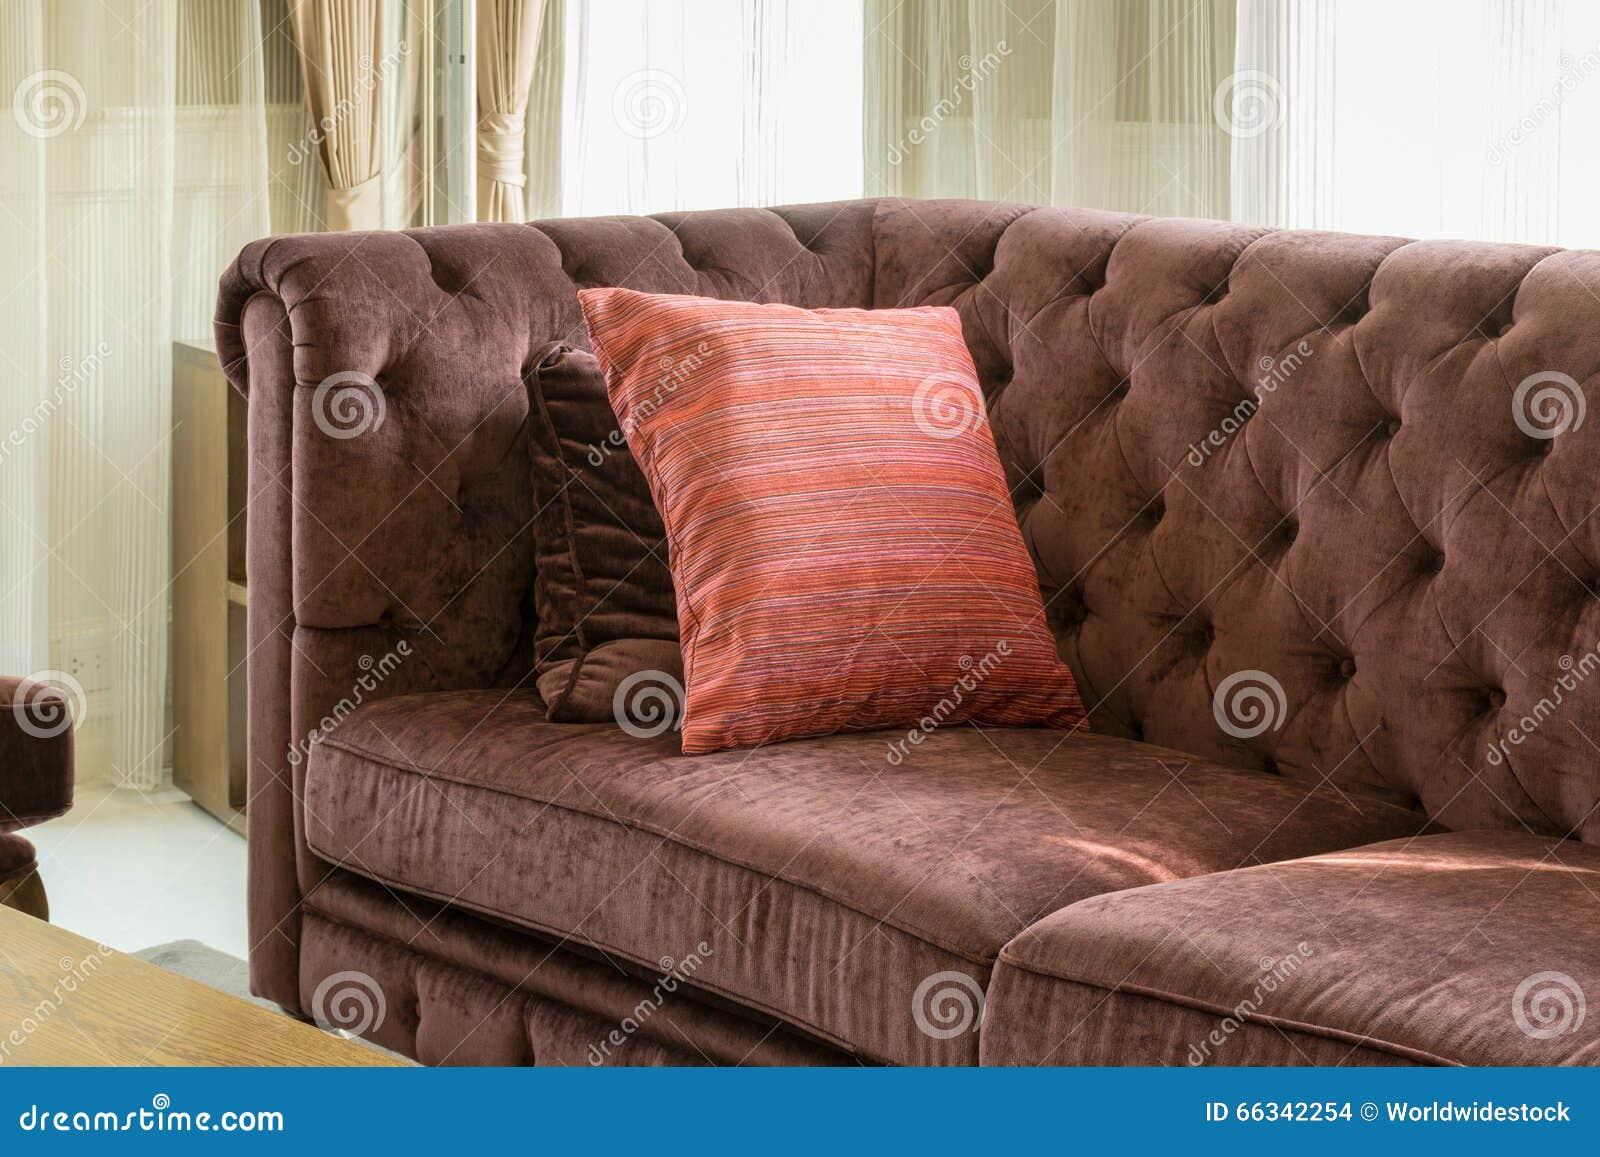 Rote Kissen Auf Rotem Sofa Im Luxuswohnzimmer Stockfoto